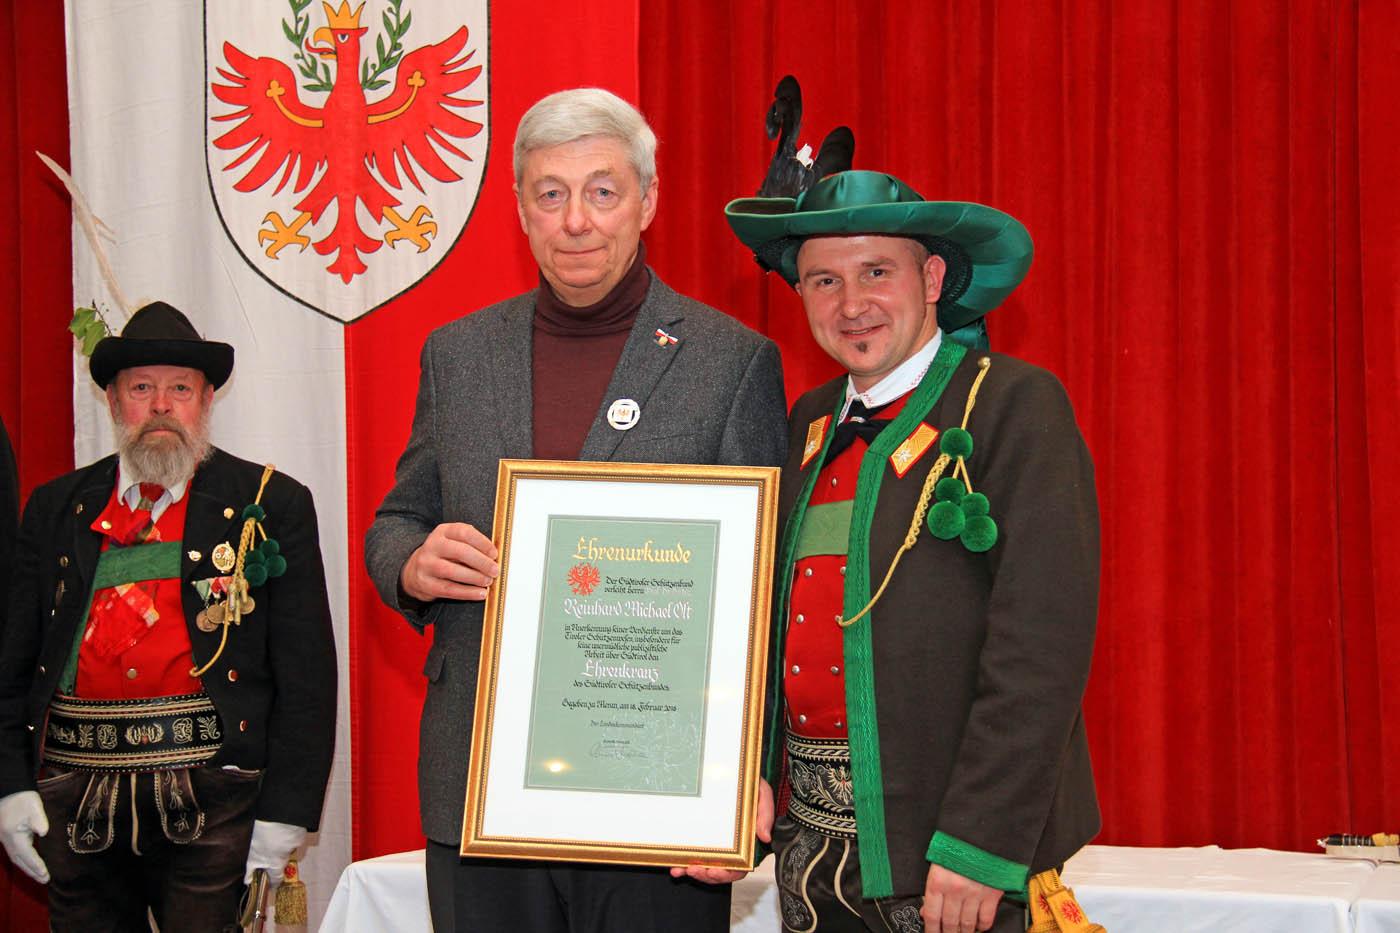 Prof. Dr. Dr. h.c. Reinhard Olt neuer Ehrenkranzträger des SSB